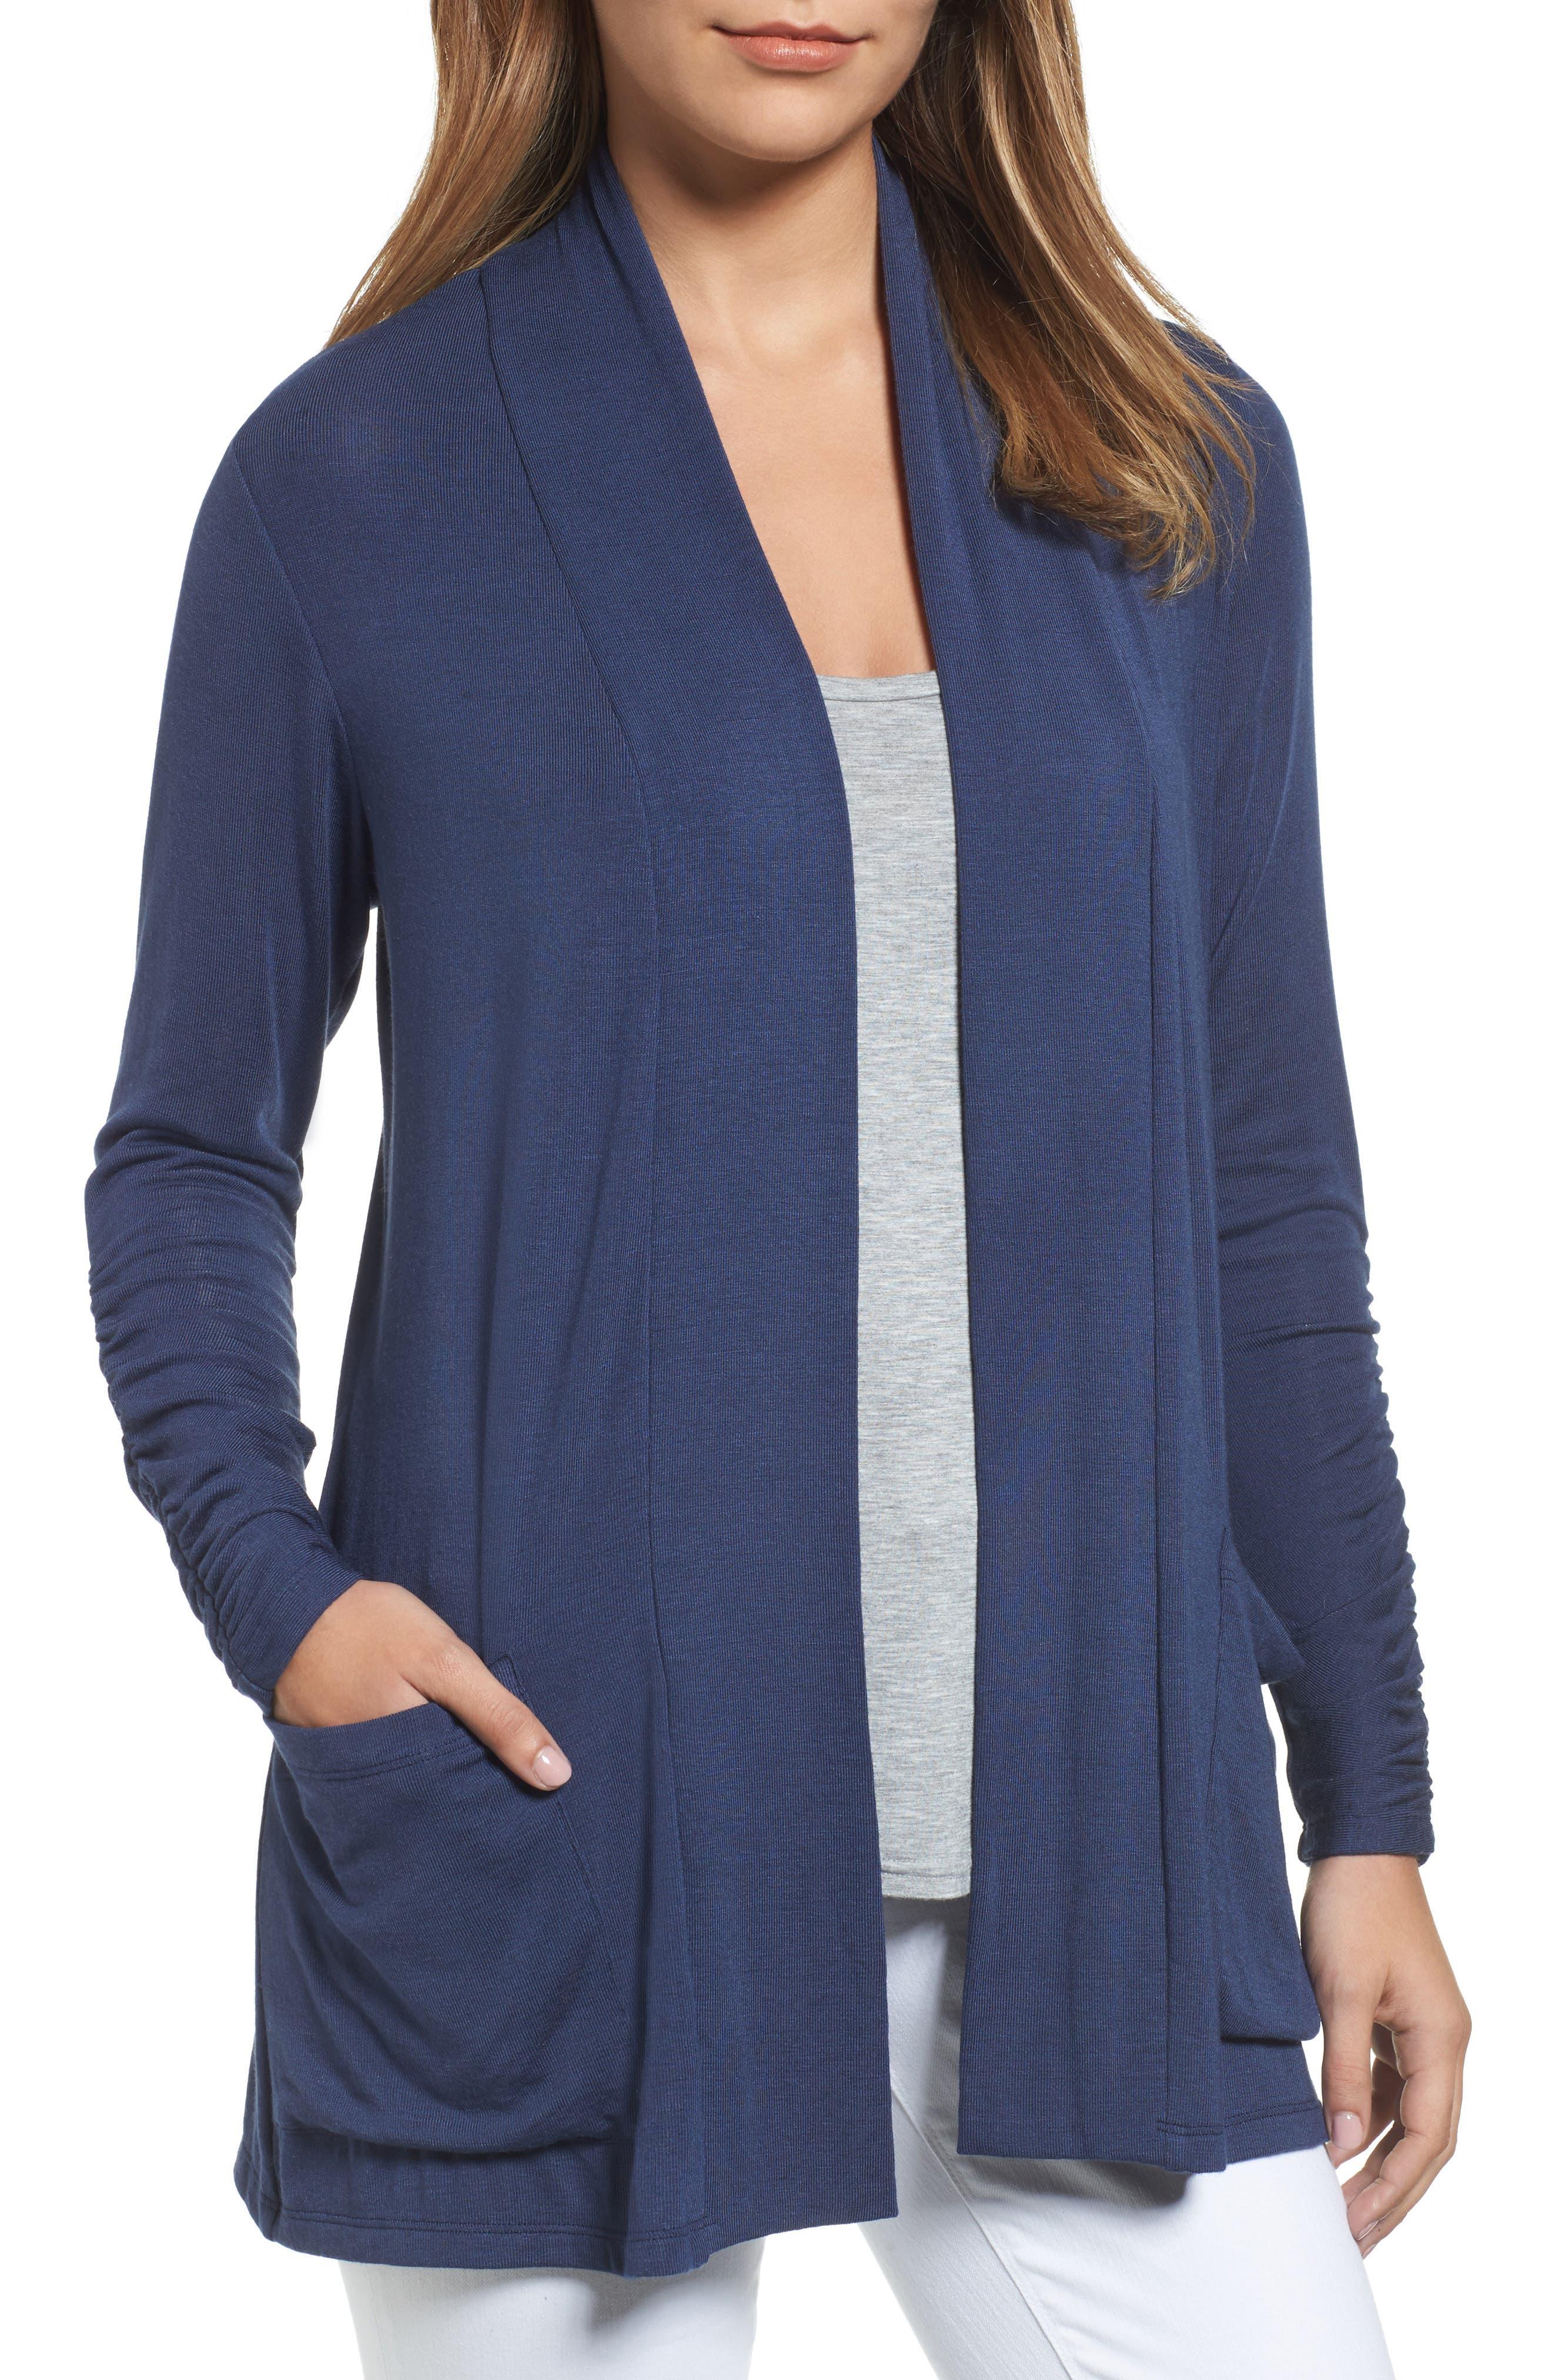 Women's Blue Cardigan Sweaters | Nordstrom